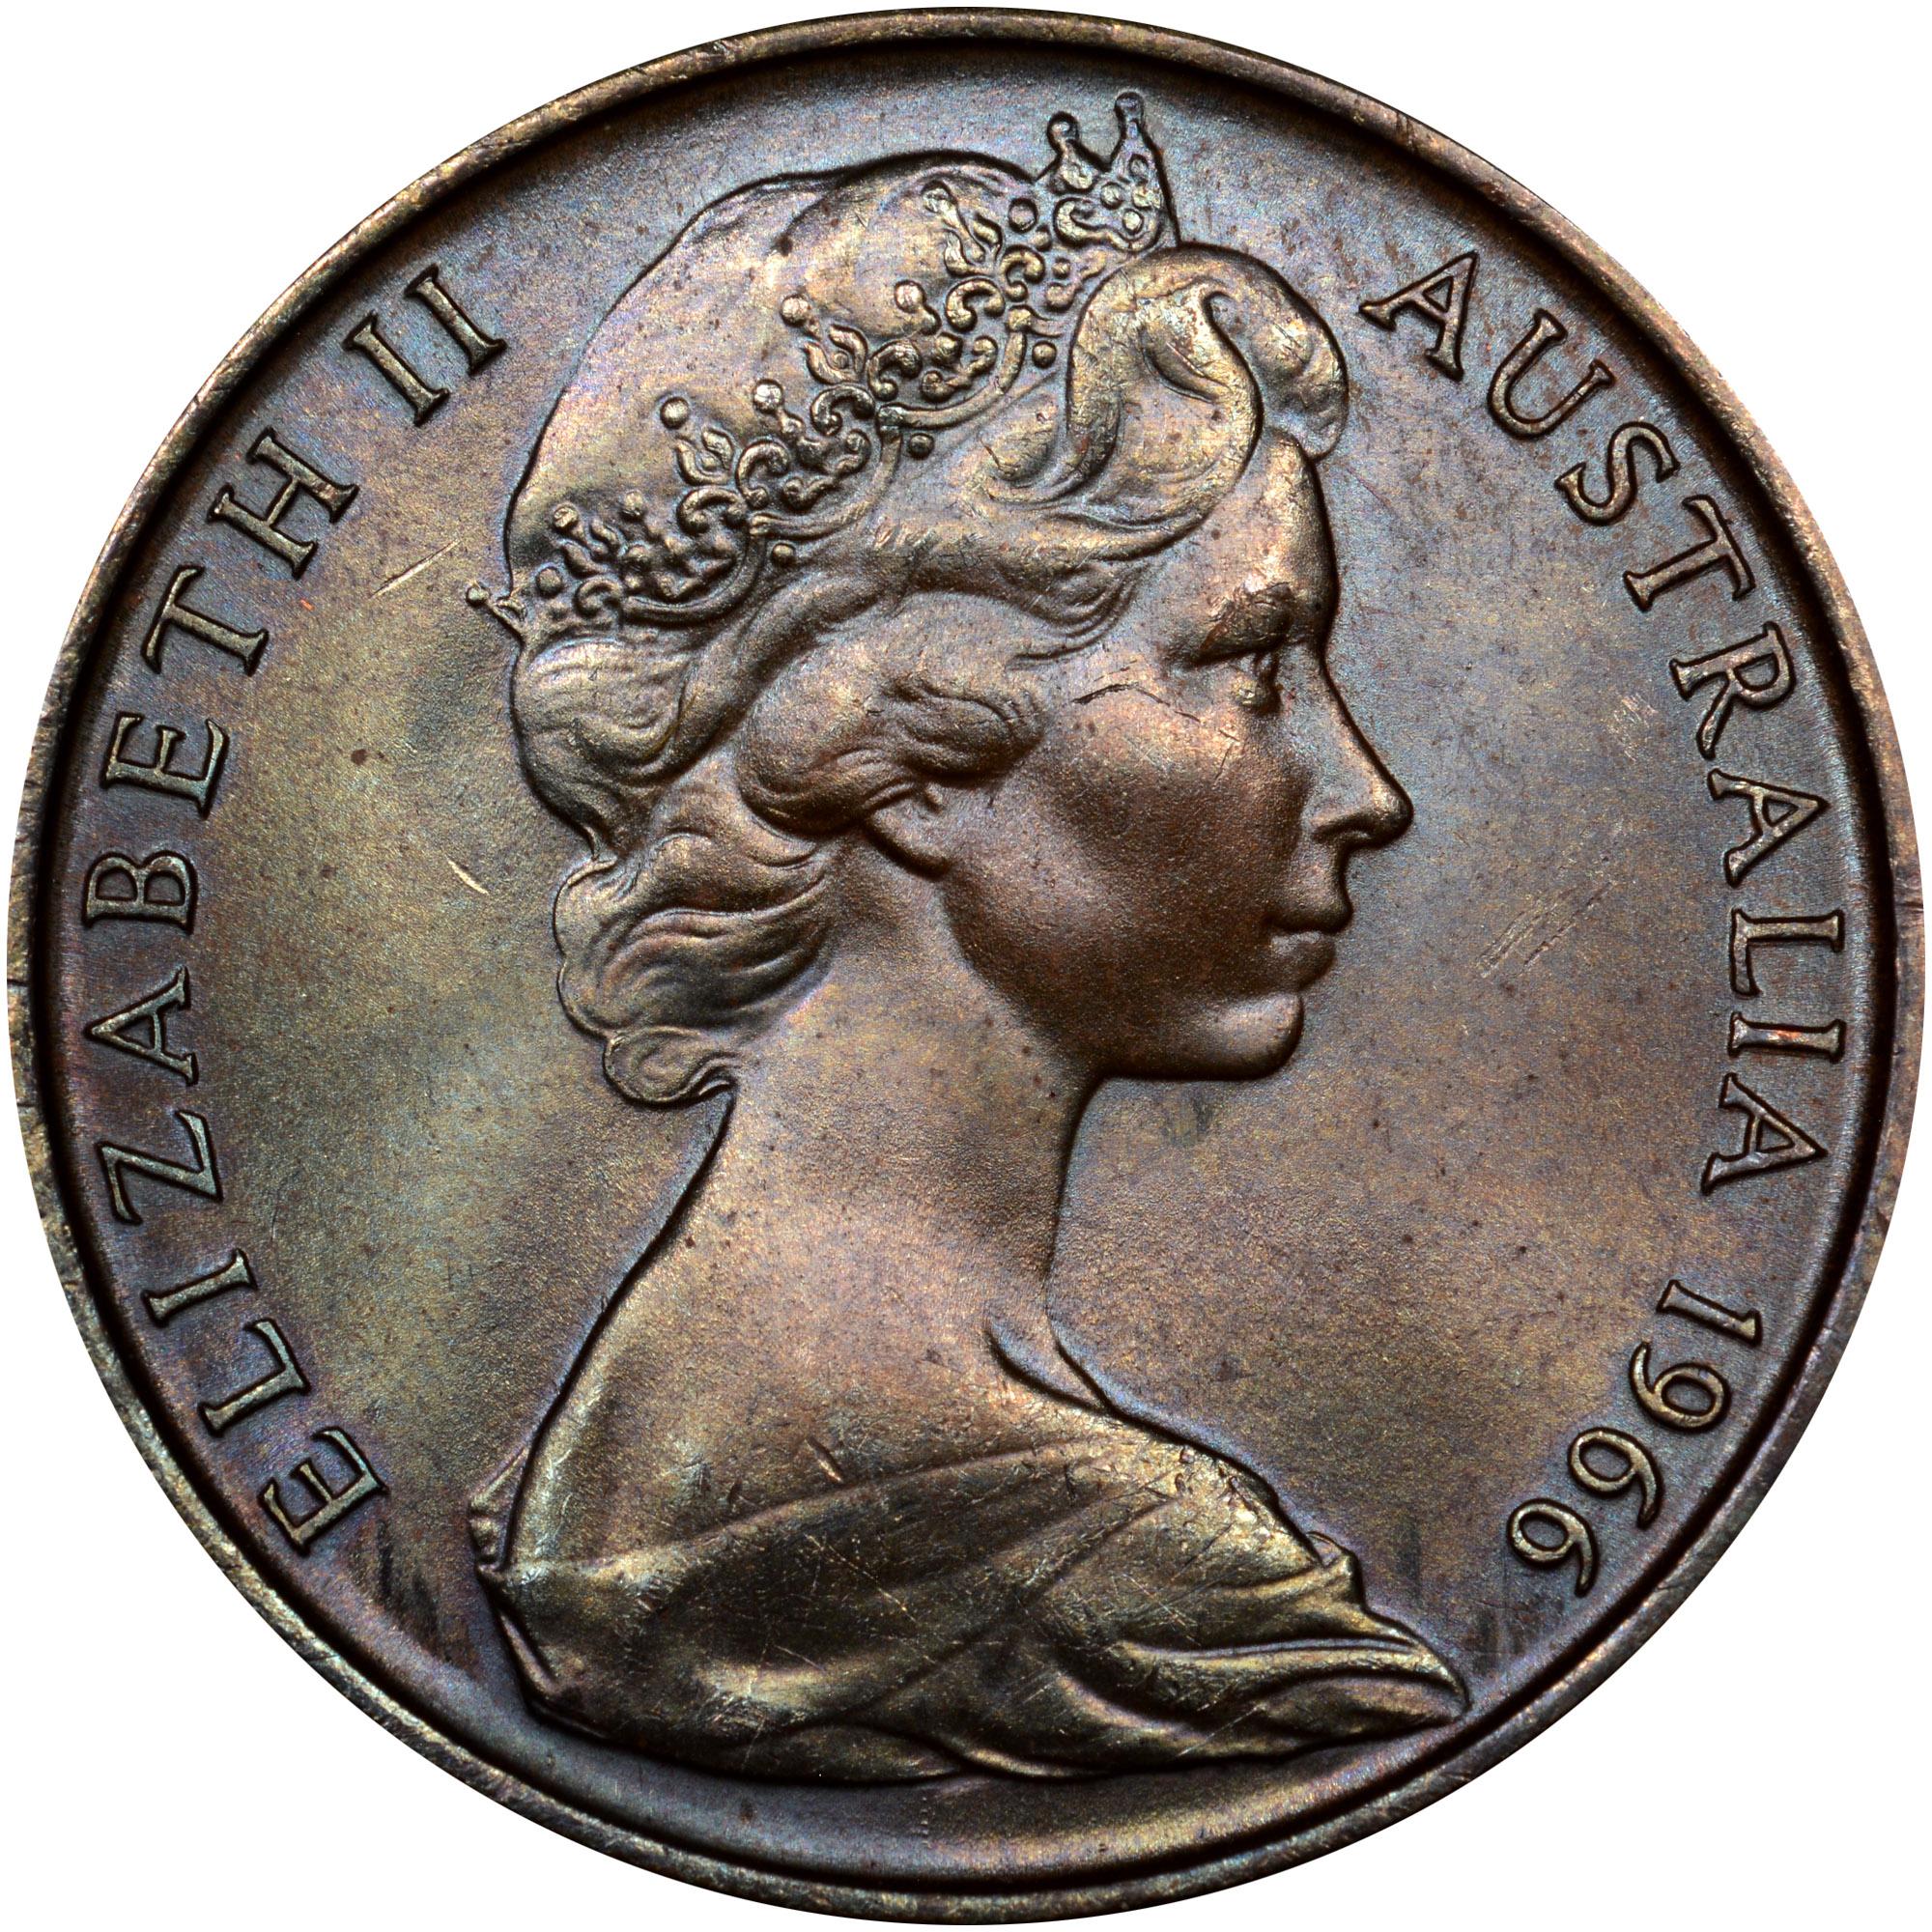 1966-1984 Australia 2 Cents obverse